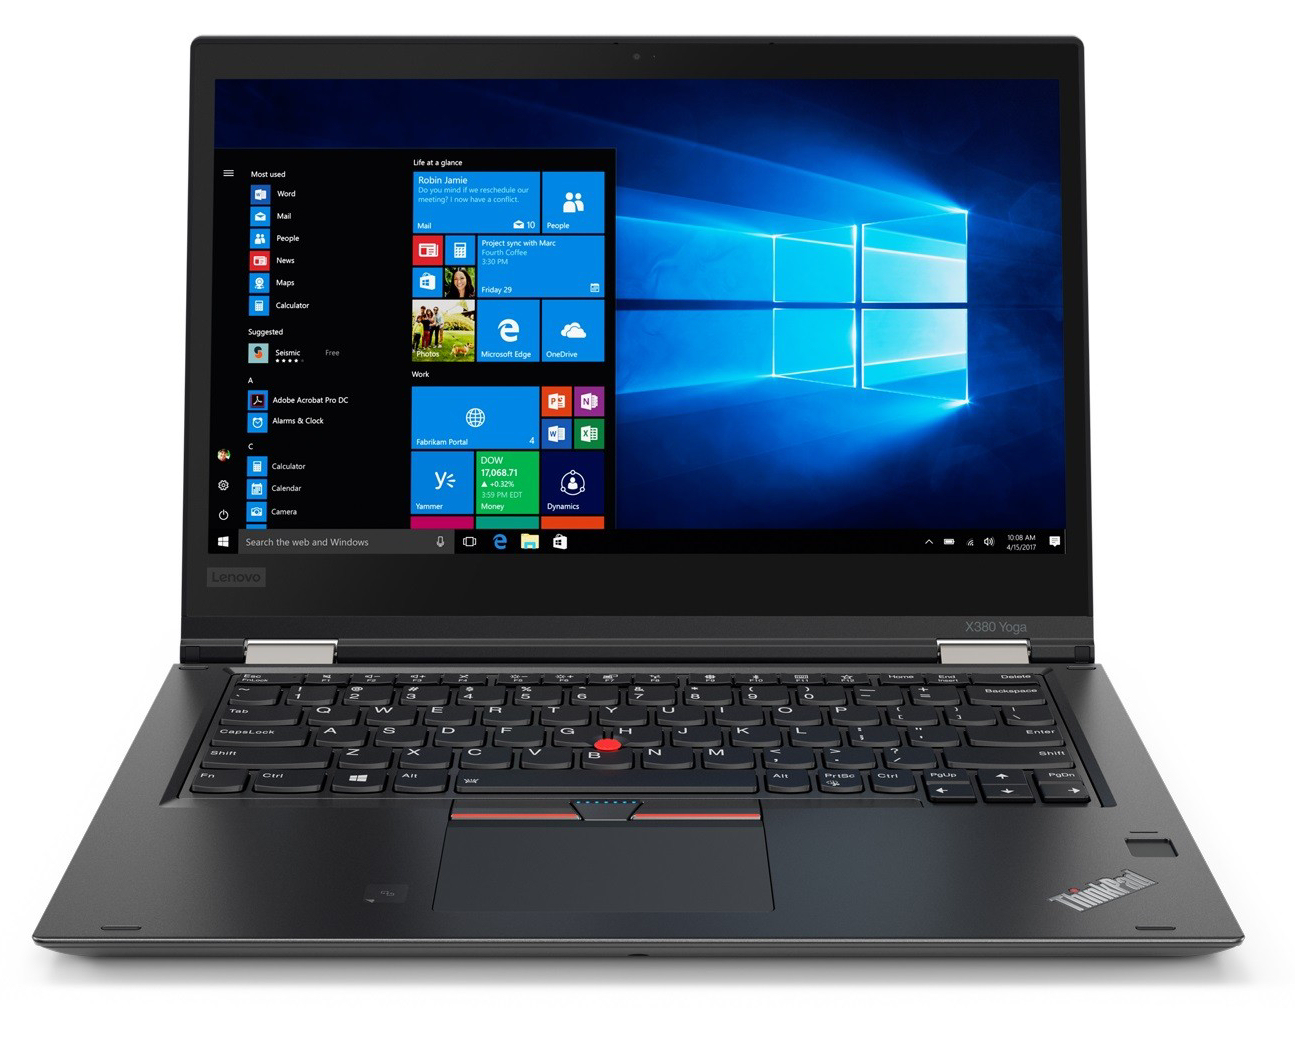 Lenovo Yoga 370 Bedienungsanleitung